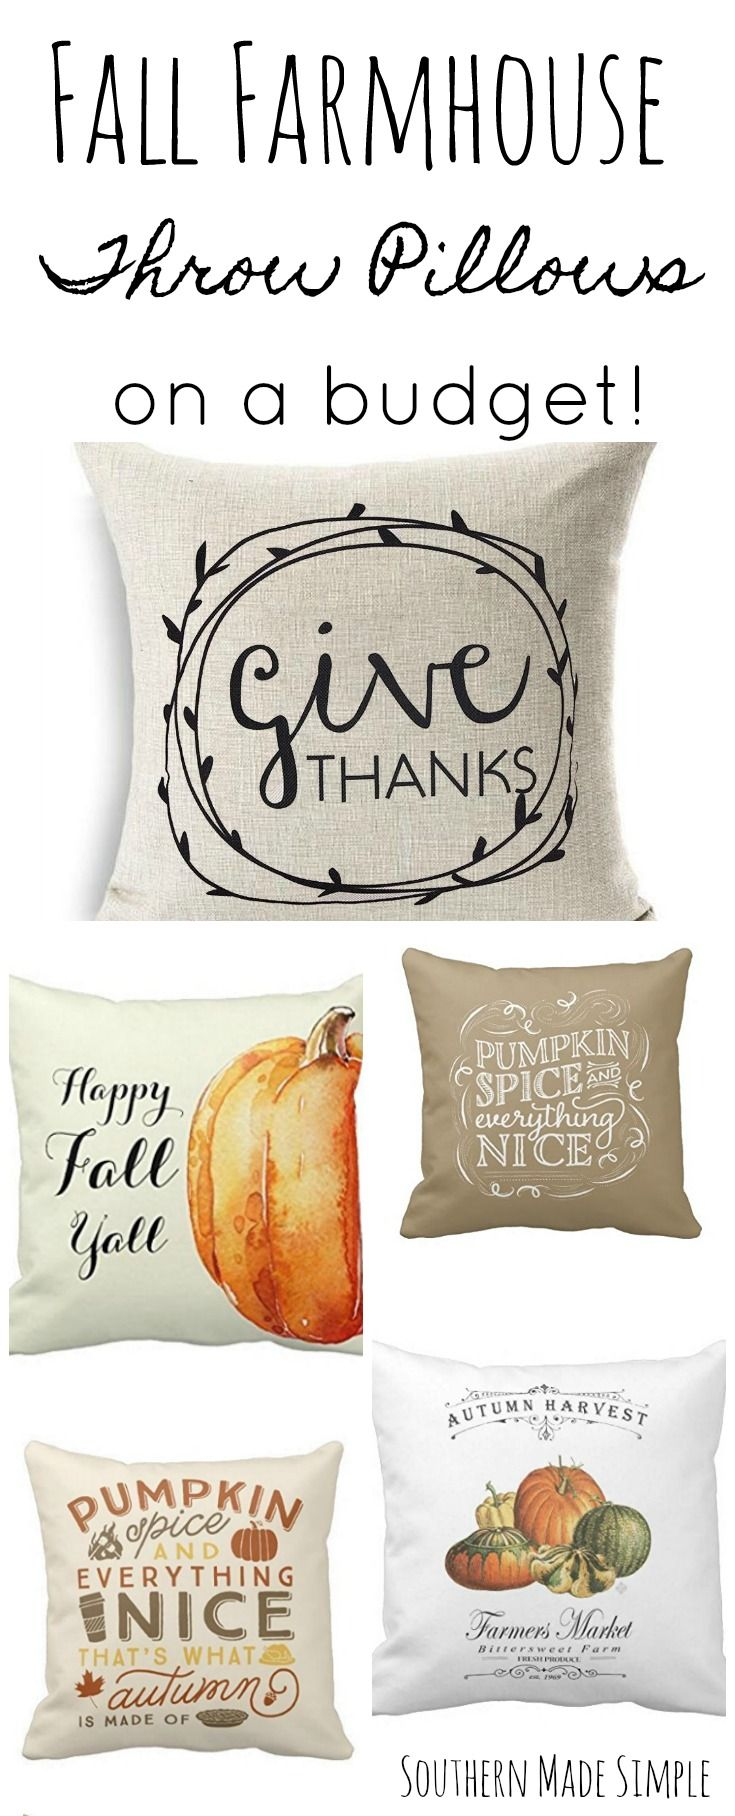 Fall Farmhouse Throw Pillows on a Budget